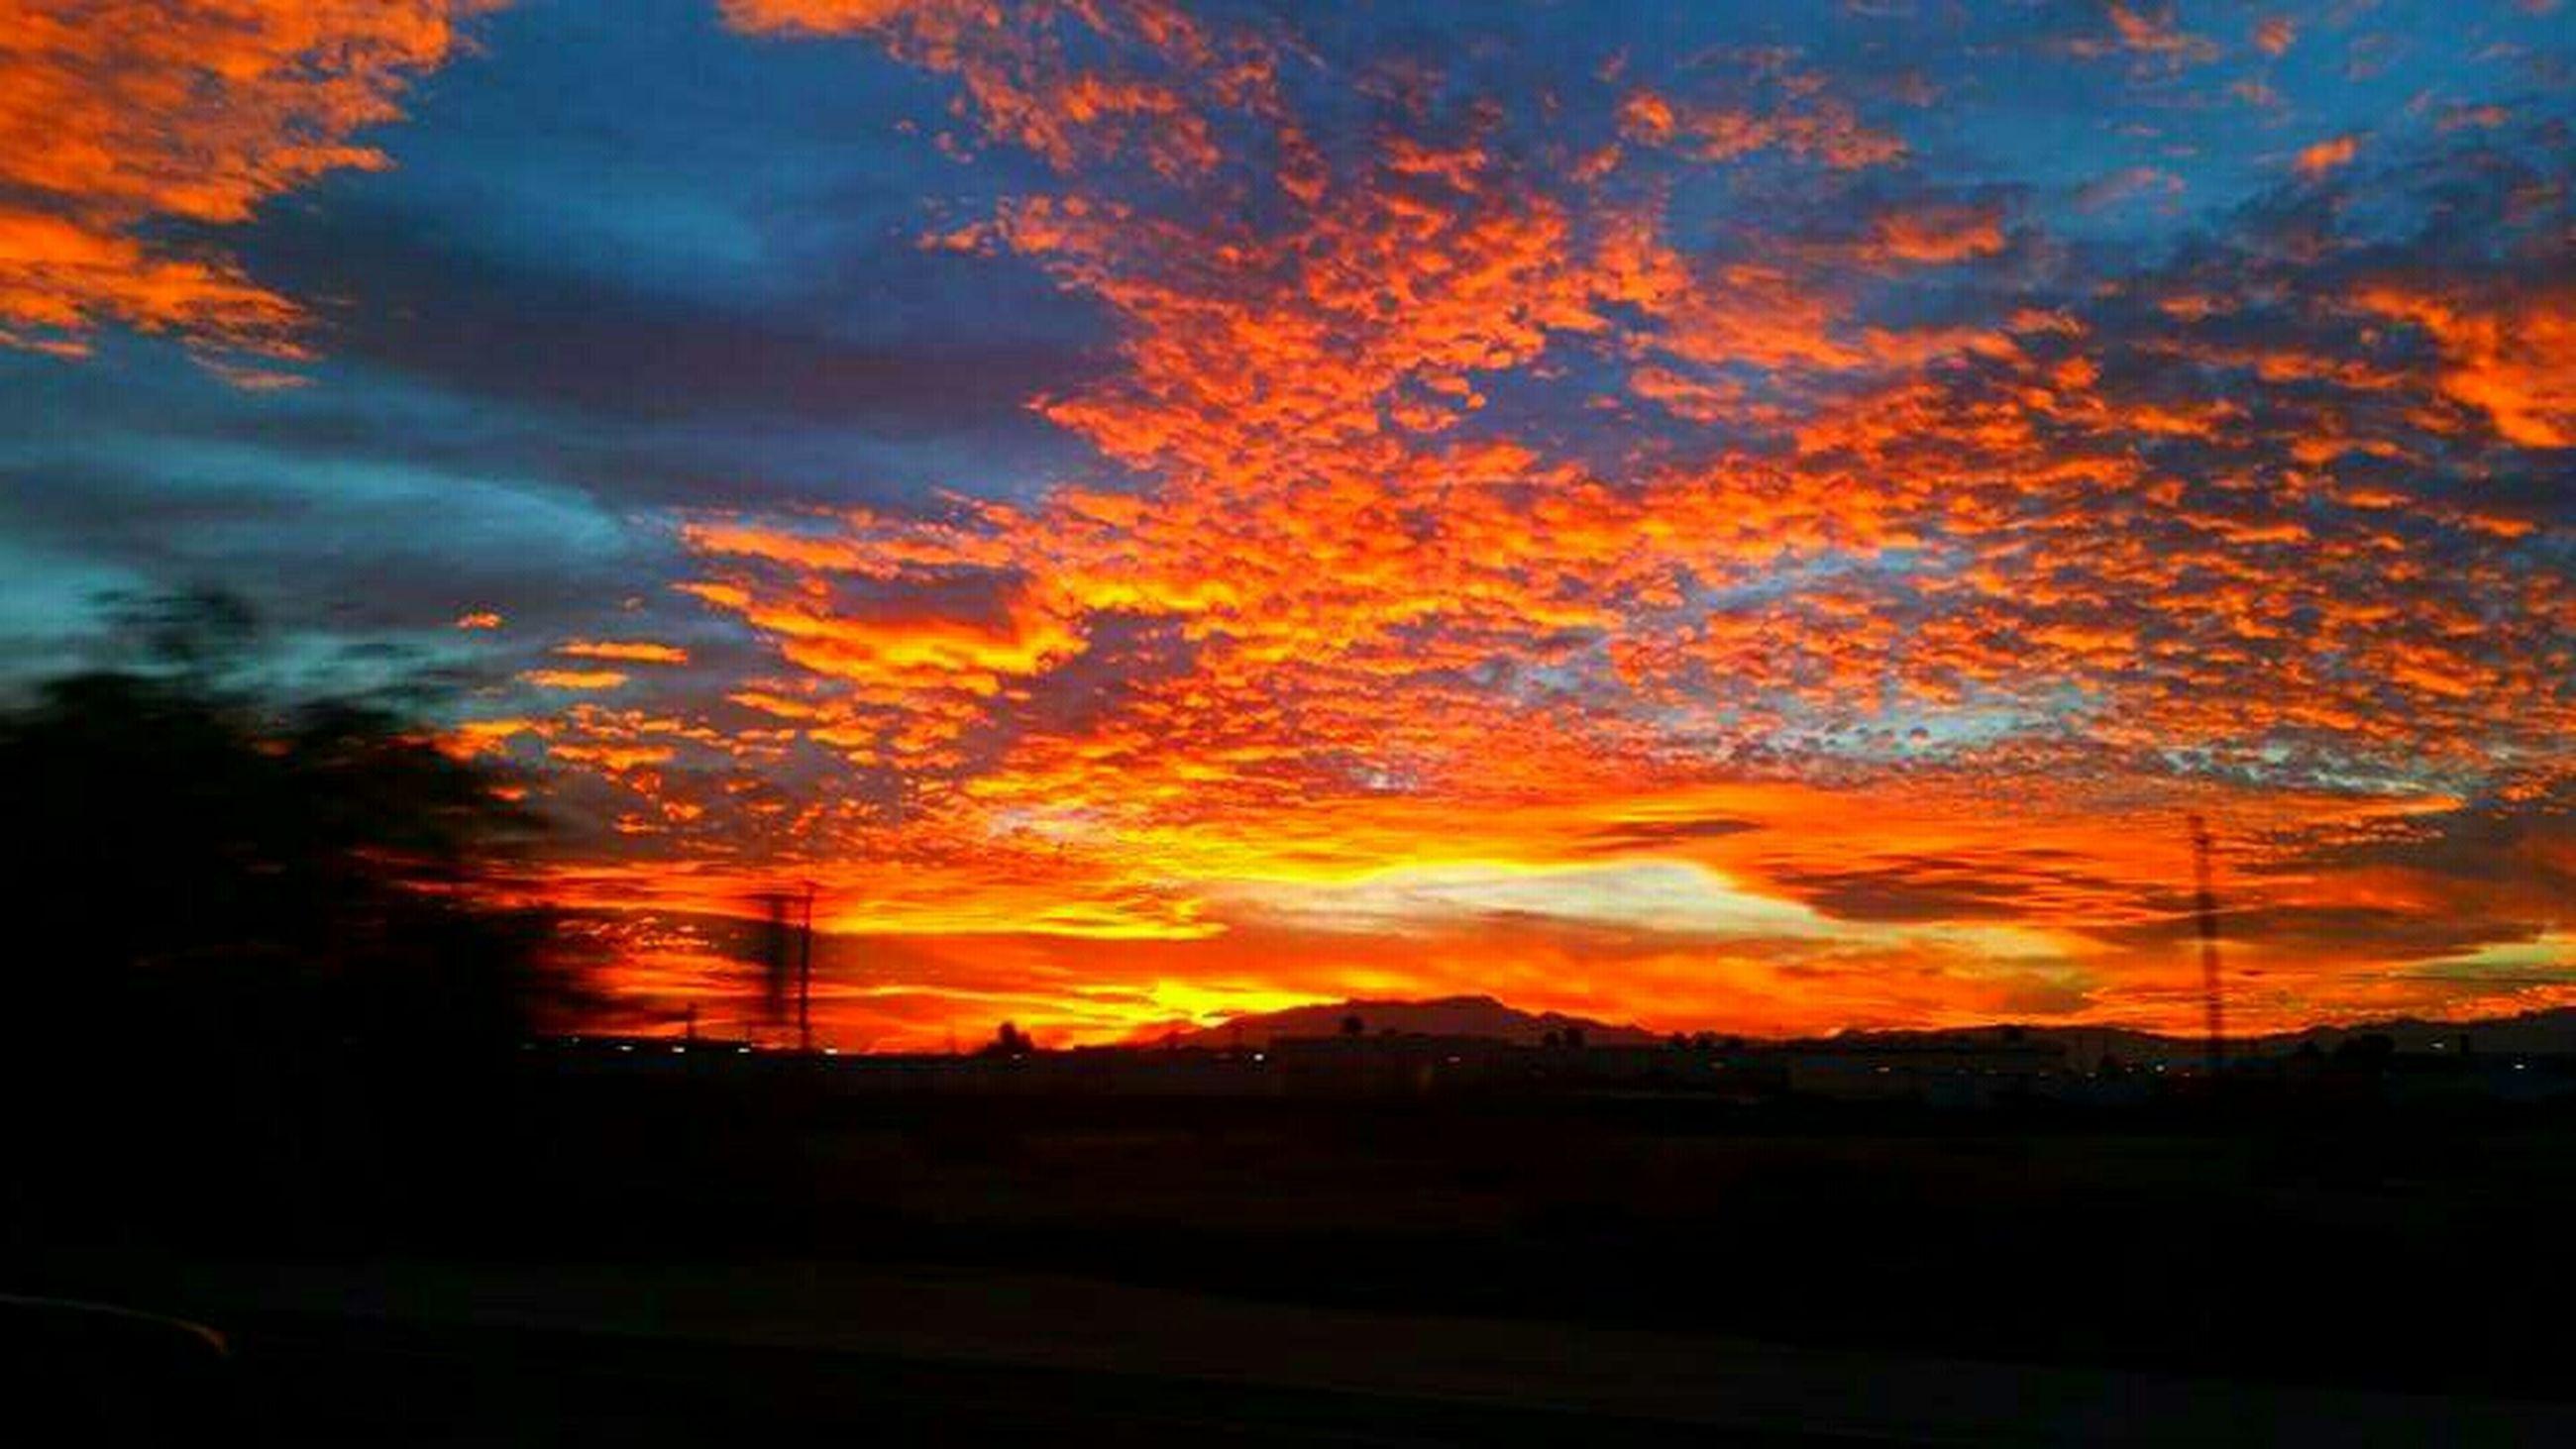 sunset, sky, orange color, silhouette, scenics, cloud - sky, beauty in nature, tranquil scene, tranquility, dramatic sky, landscape, idyllic, nature, cloud, moody sky, cloudy, atmospheric mood, majestic, field, dark